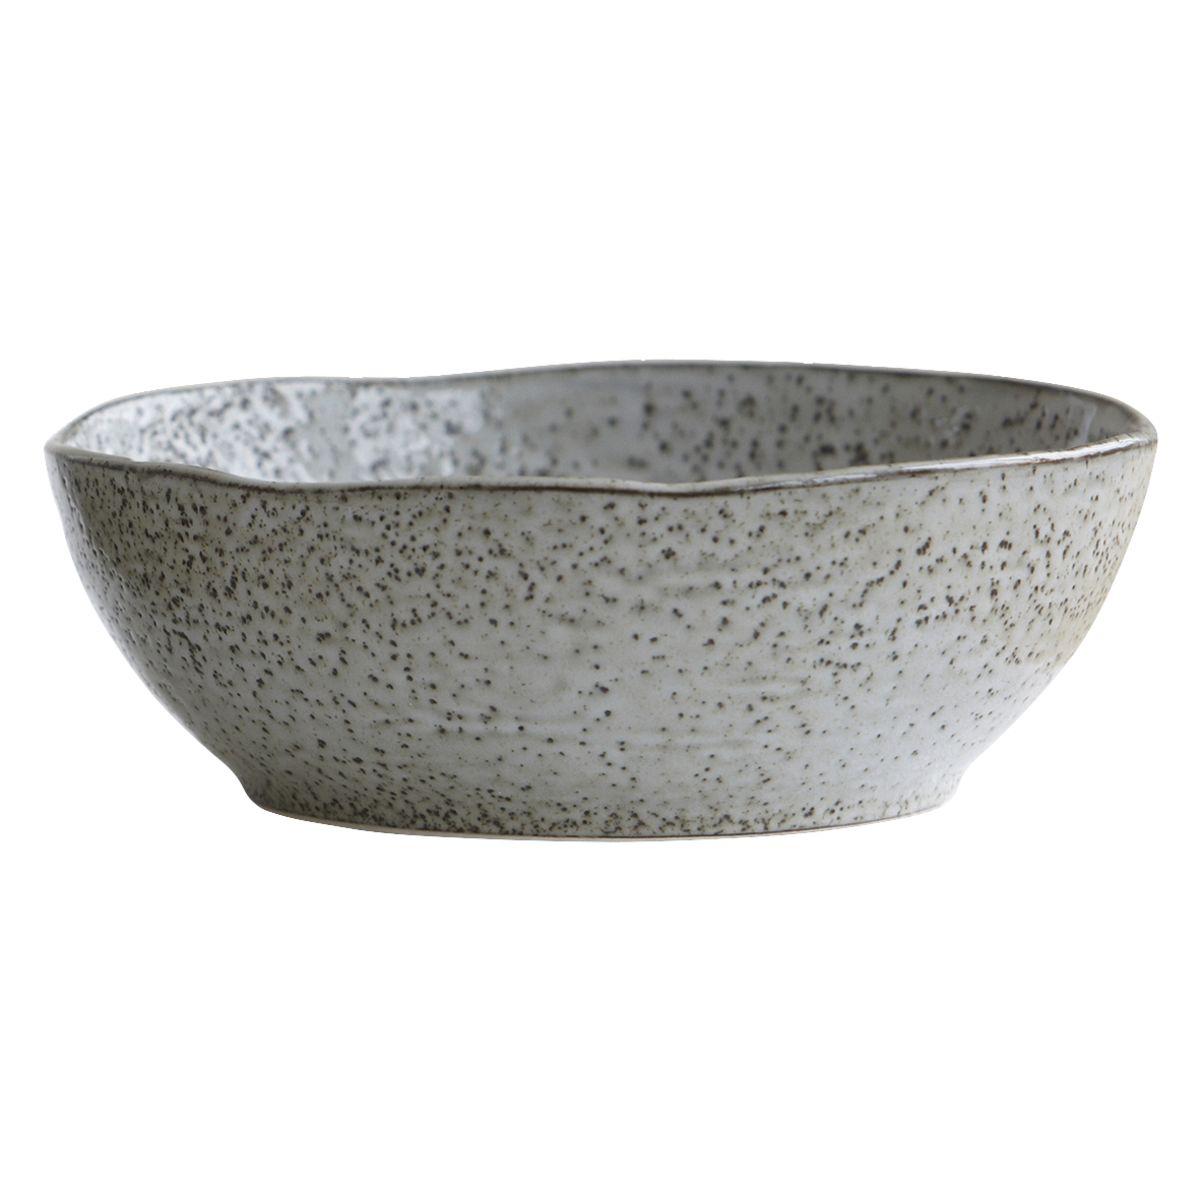 House Doctor - Rustic Bowl 21,5 cm (Hc0810)